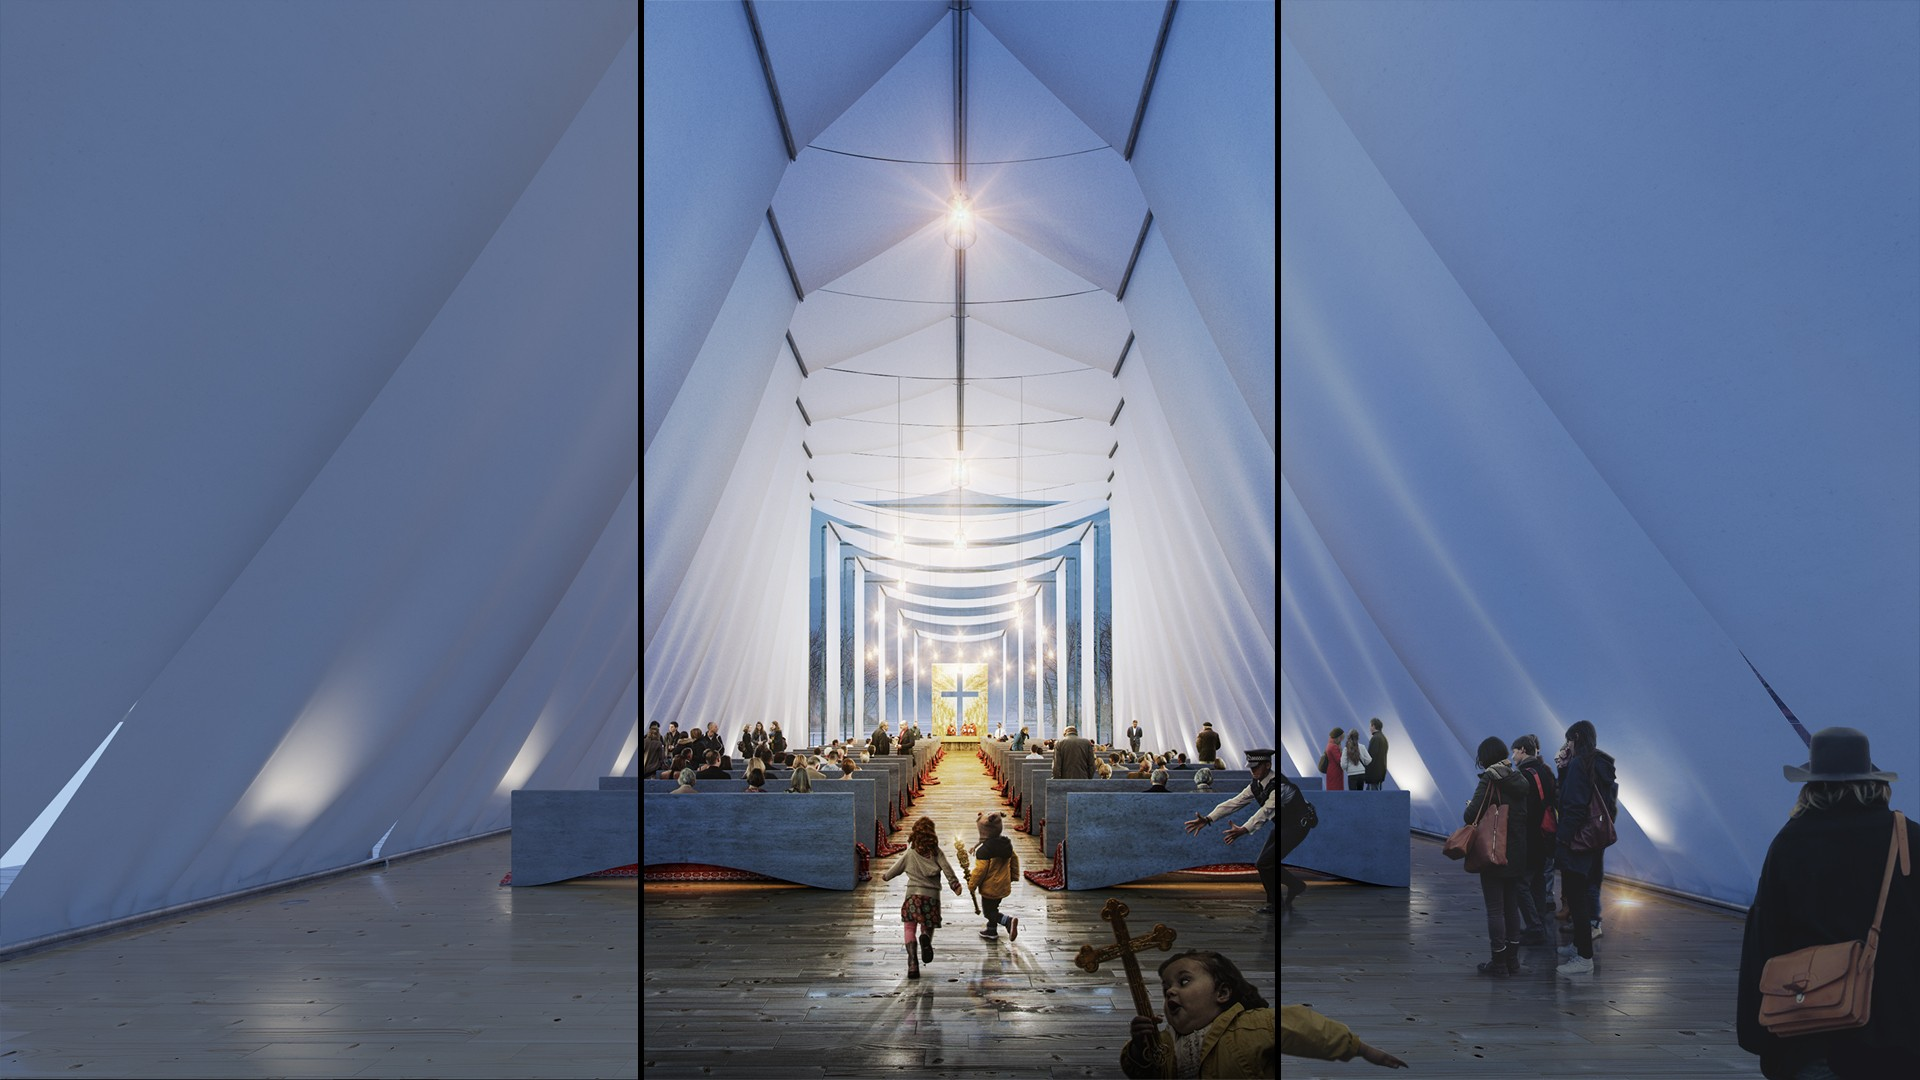 PSD - Wind Chapel Interior